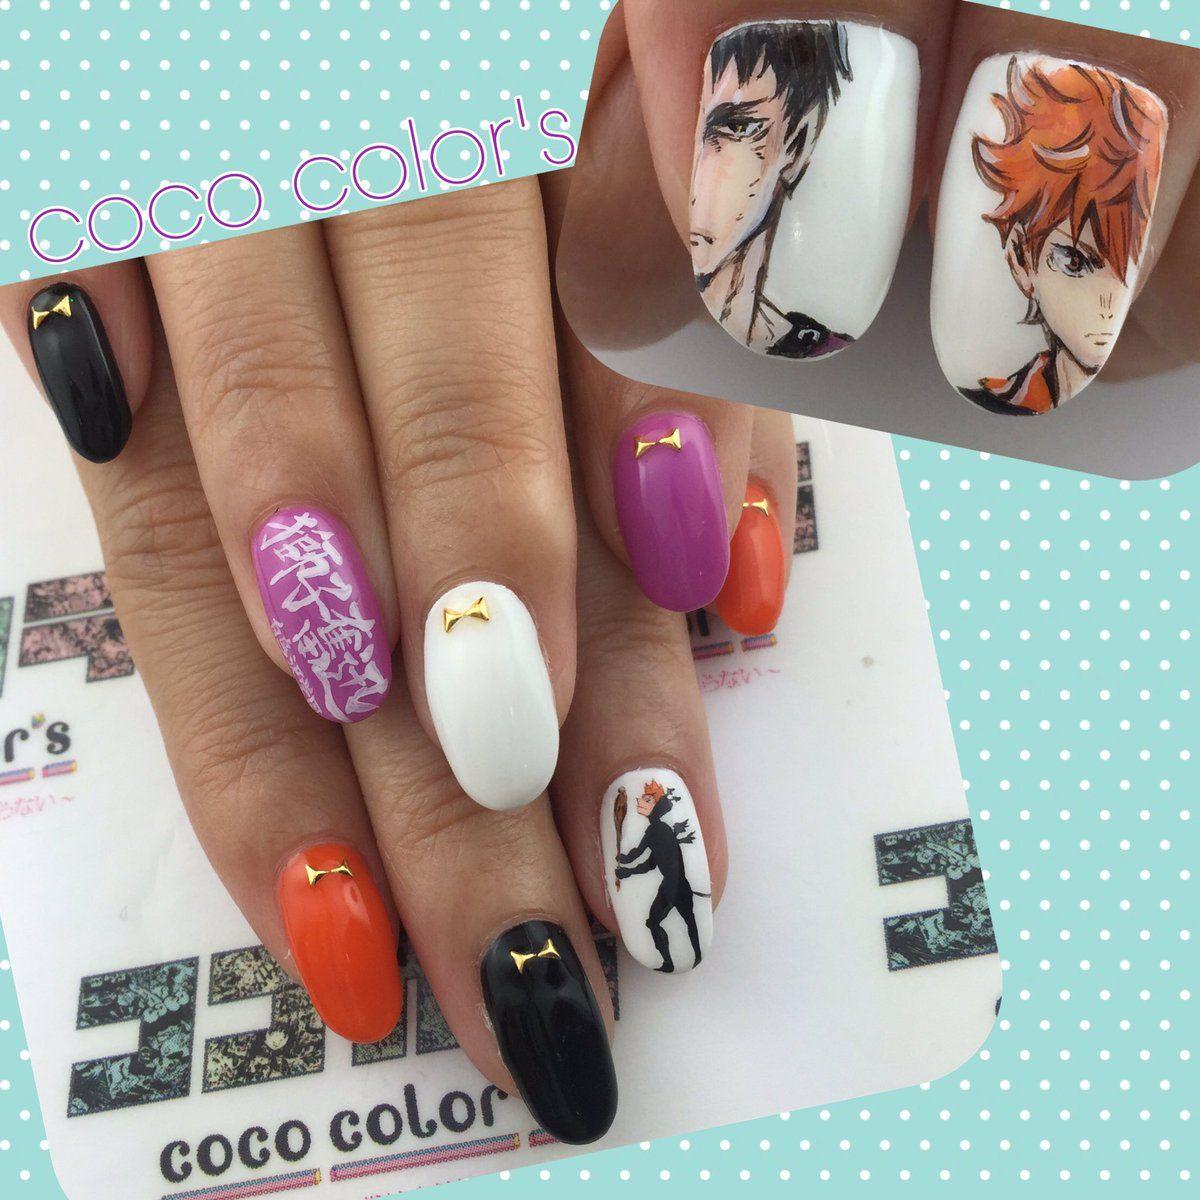 Anime nail art haikyuu hinata anime nail art pinterest anime anime nail art haikyuu hinata prinsesfo Gallery